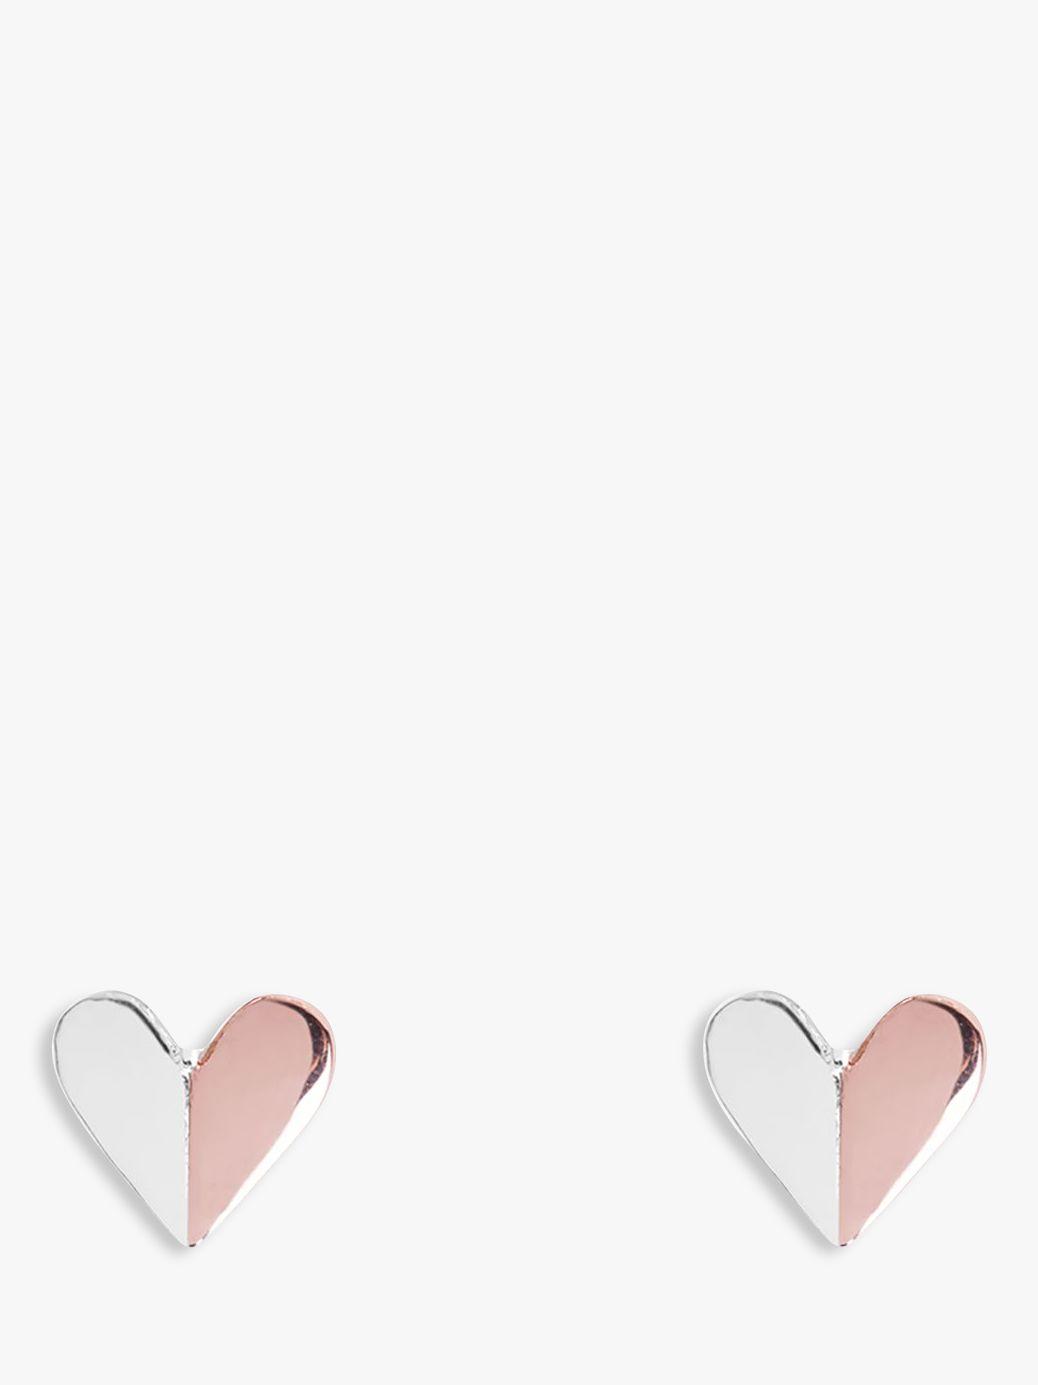 Joma Joma Valentina Heart Stud Earrings, Silver/Rose Gold